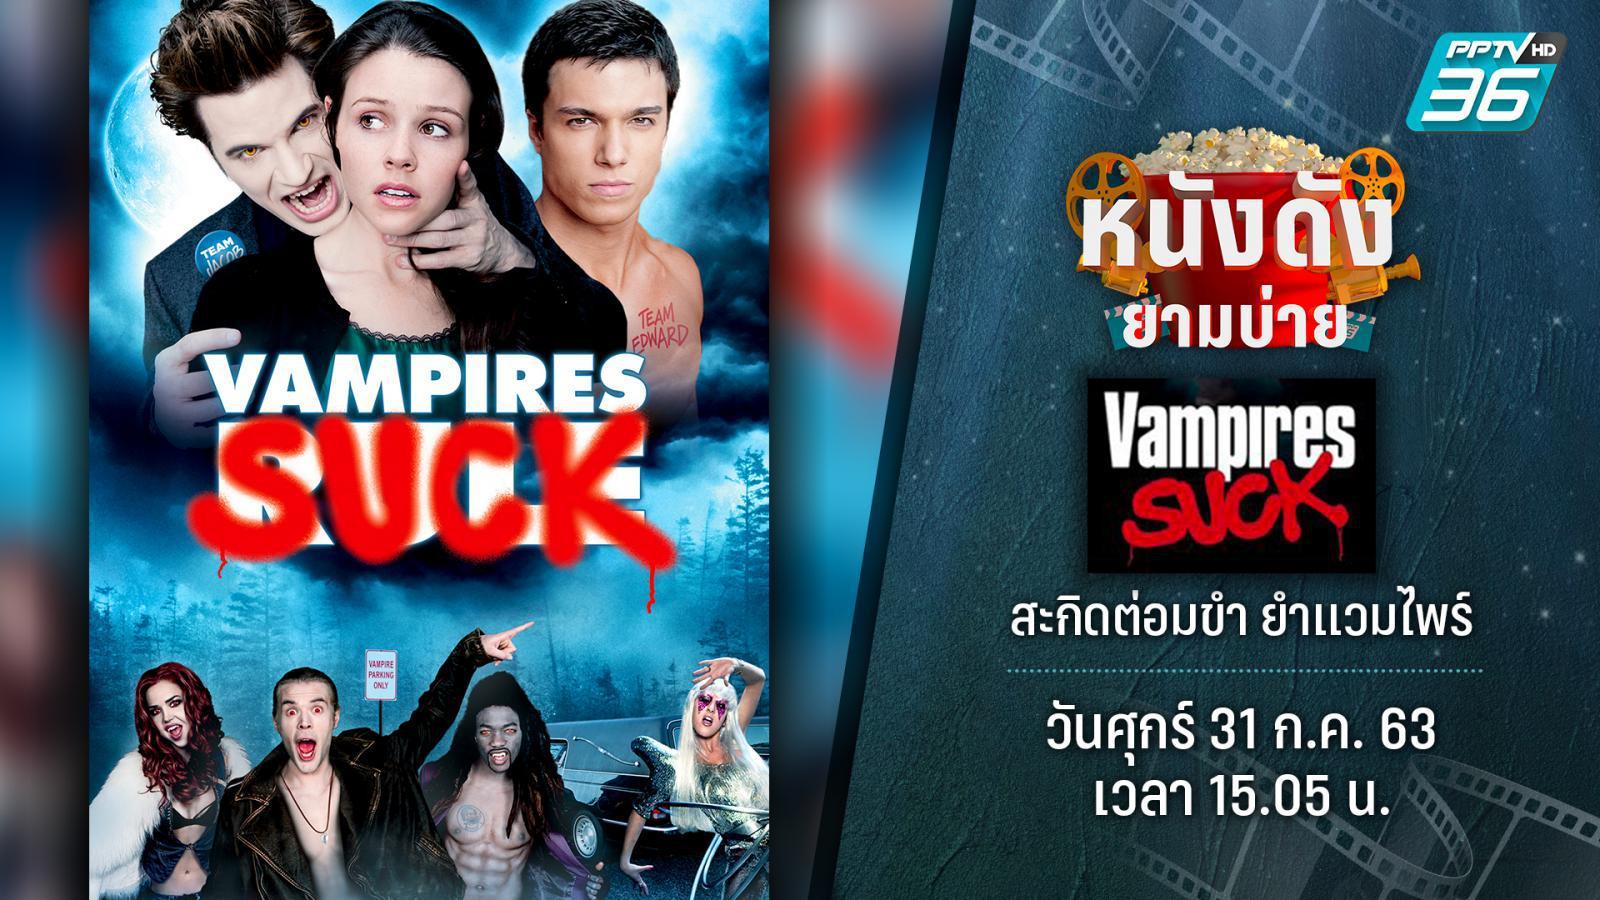 Vampire Suck สะกิดต่อมขำ ยำแวมไพร์